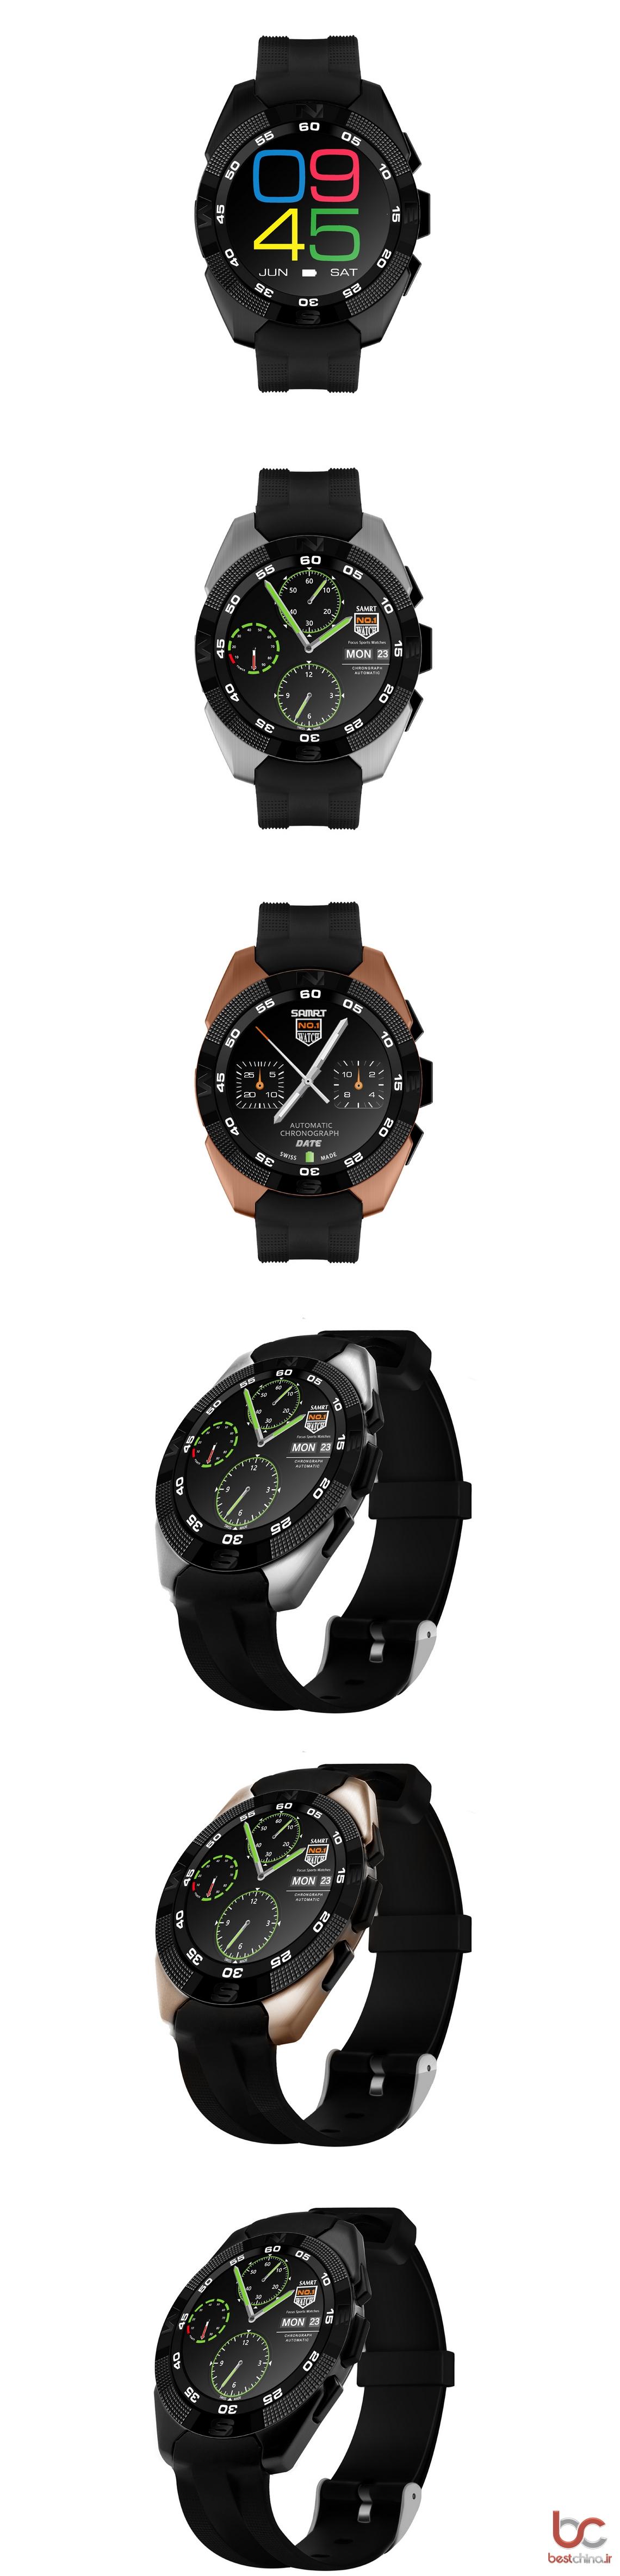 NO.1 G5 Smartwatch (8)